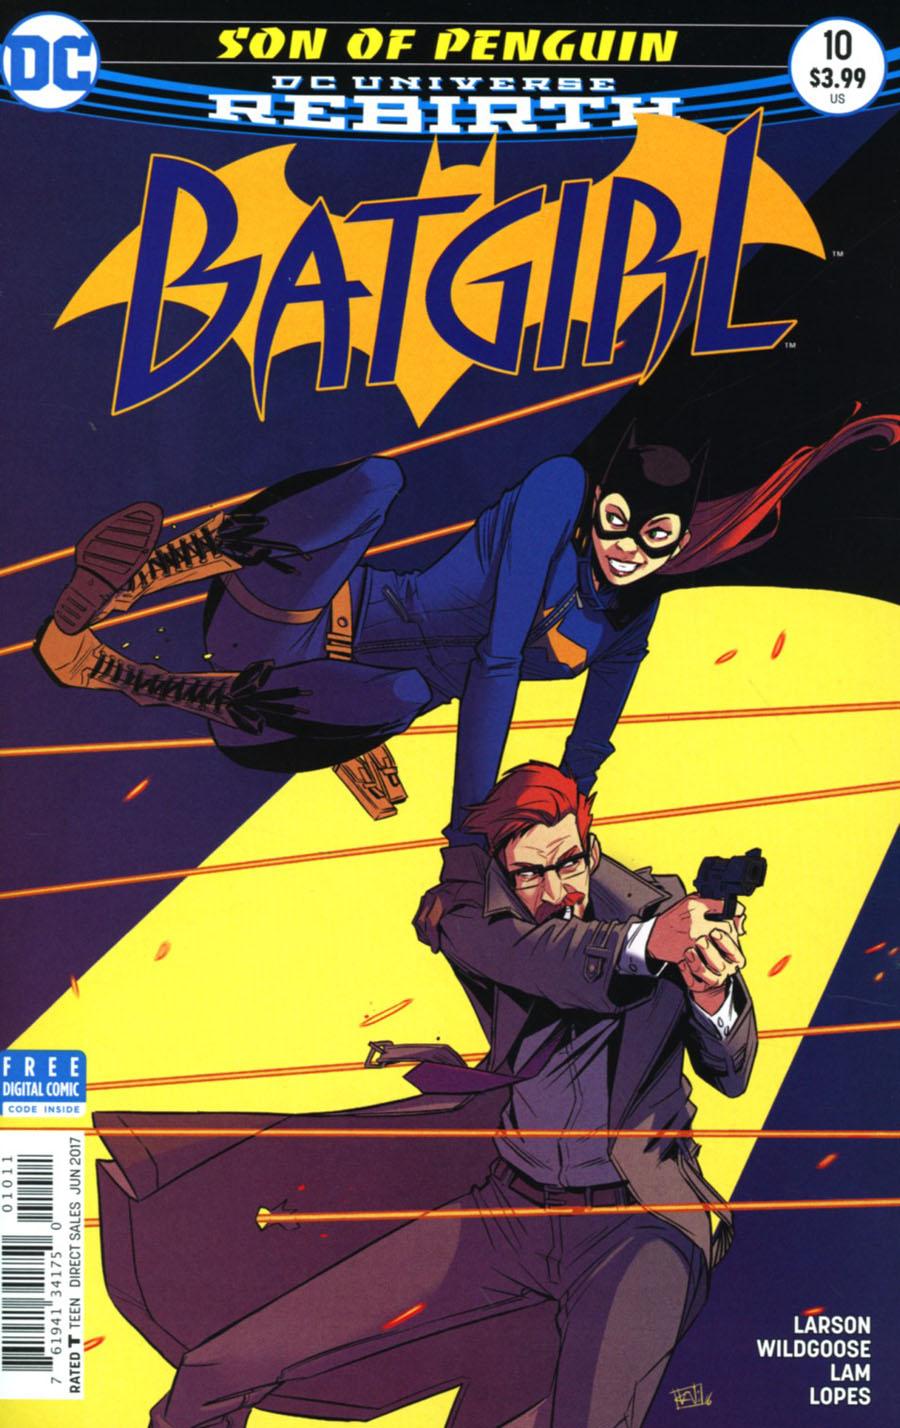 Batgirl Vol 5 #10 Cover A Regular Chris Wildgoose Cover